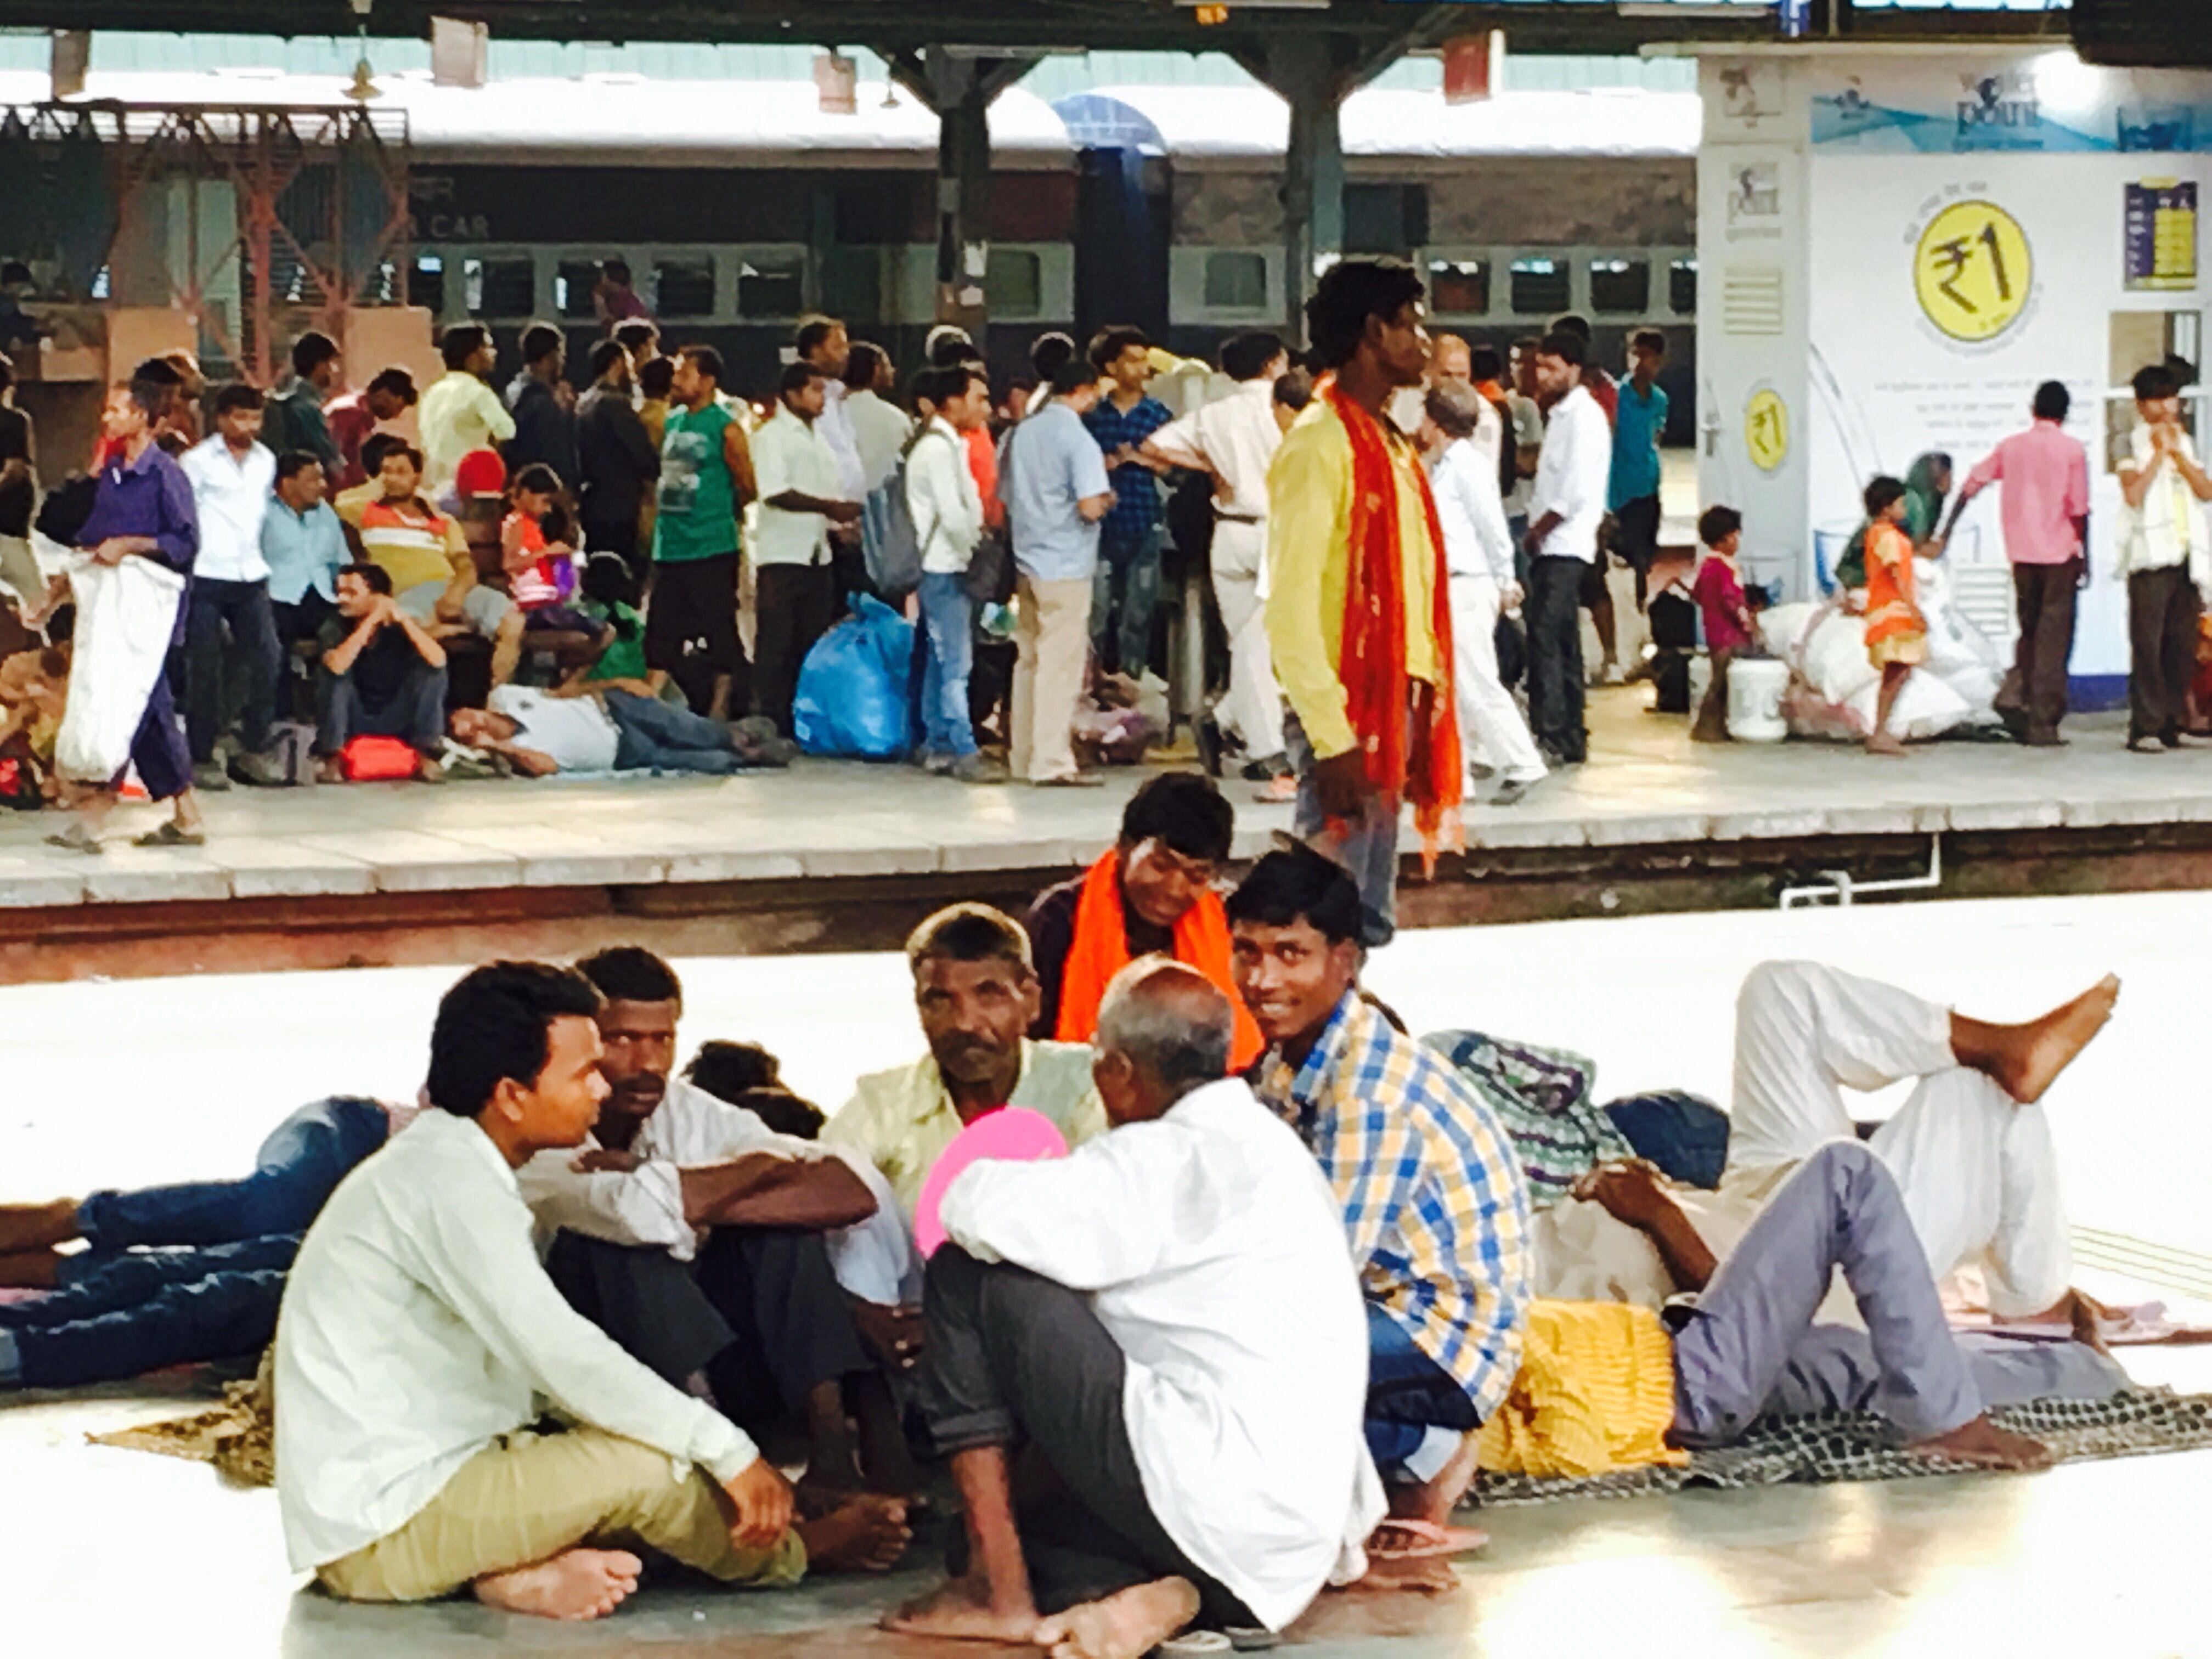 Indian train journey an overnight experience shikhar